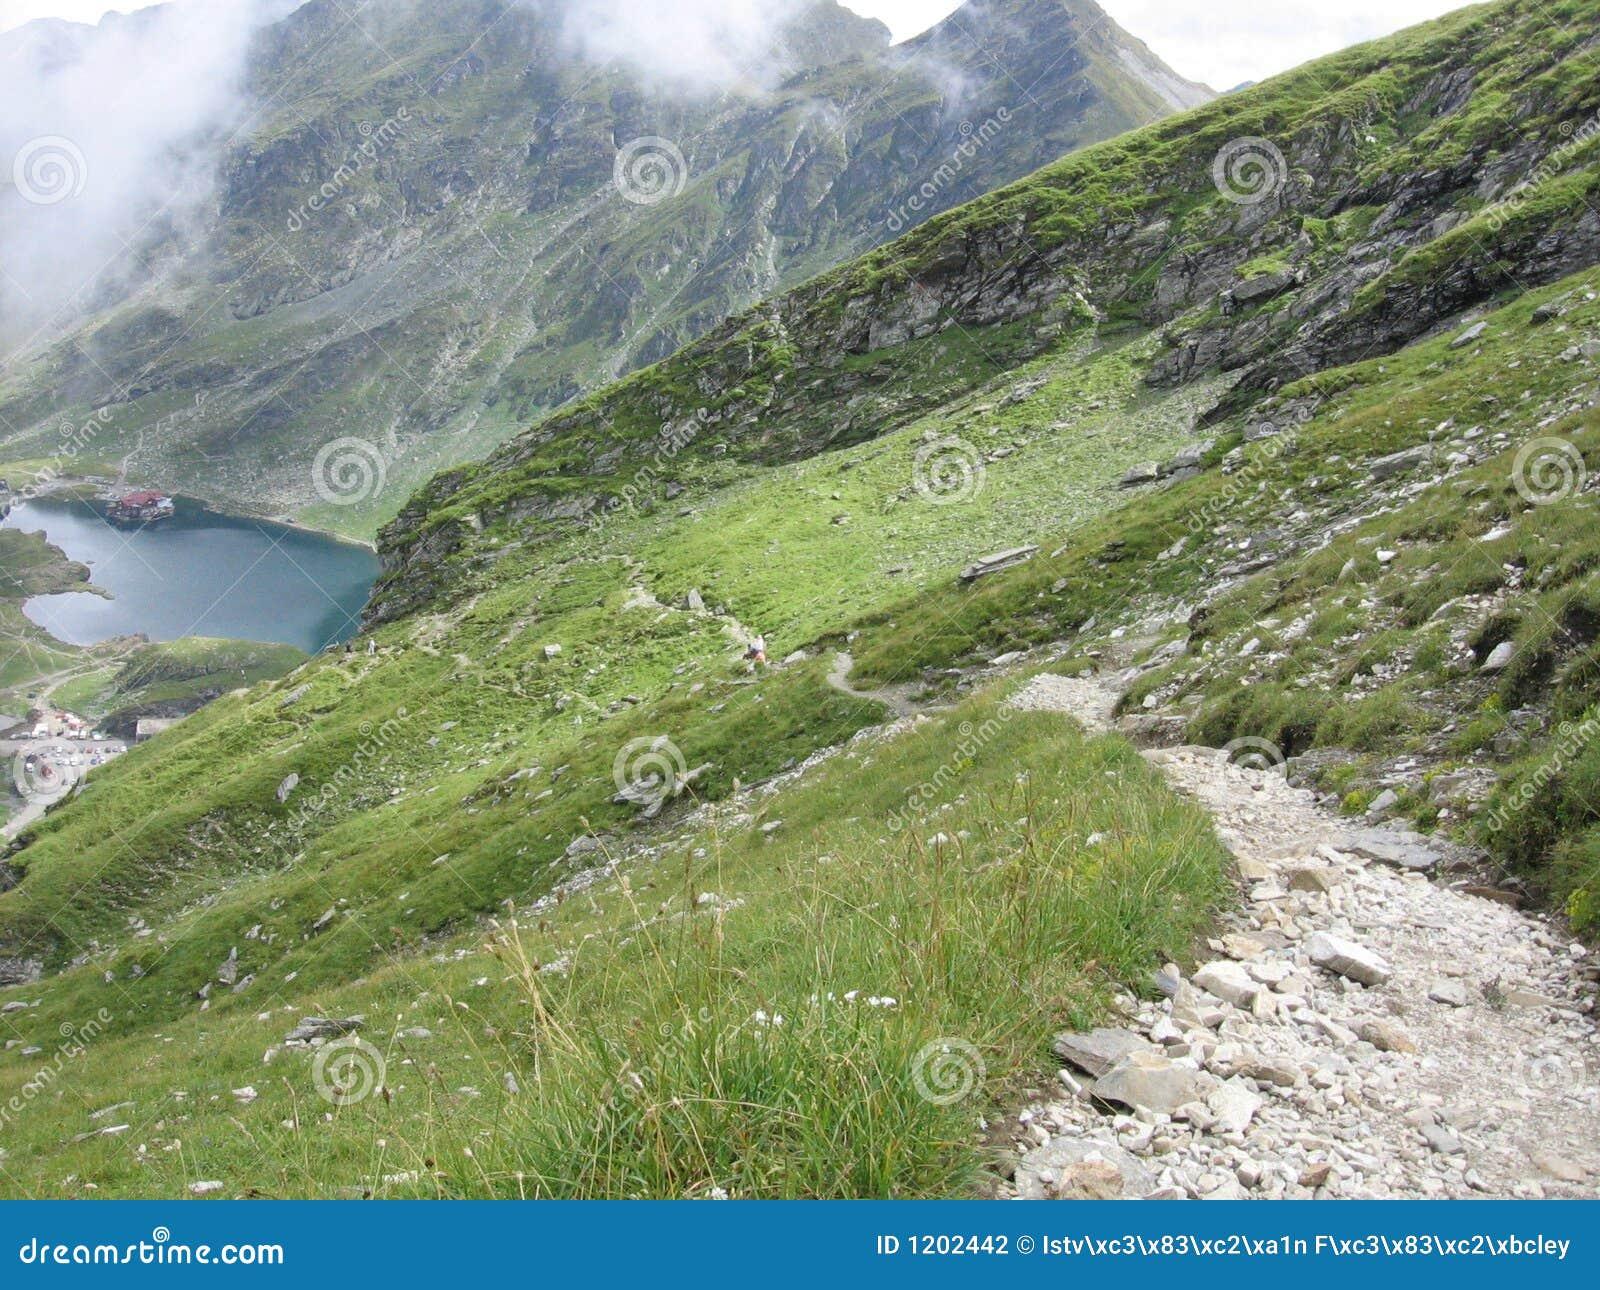 Mountain footpath